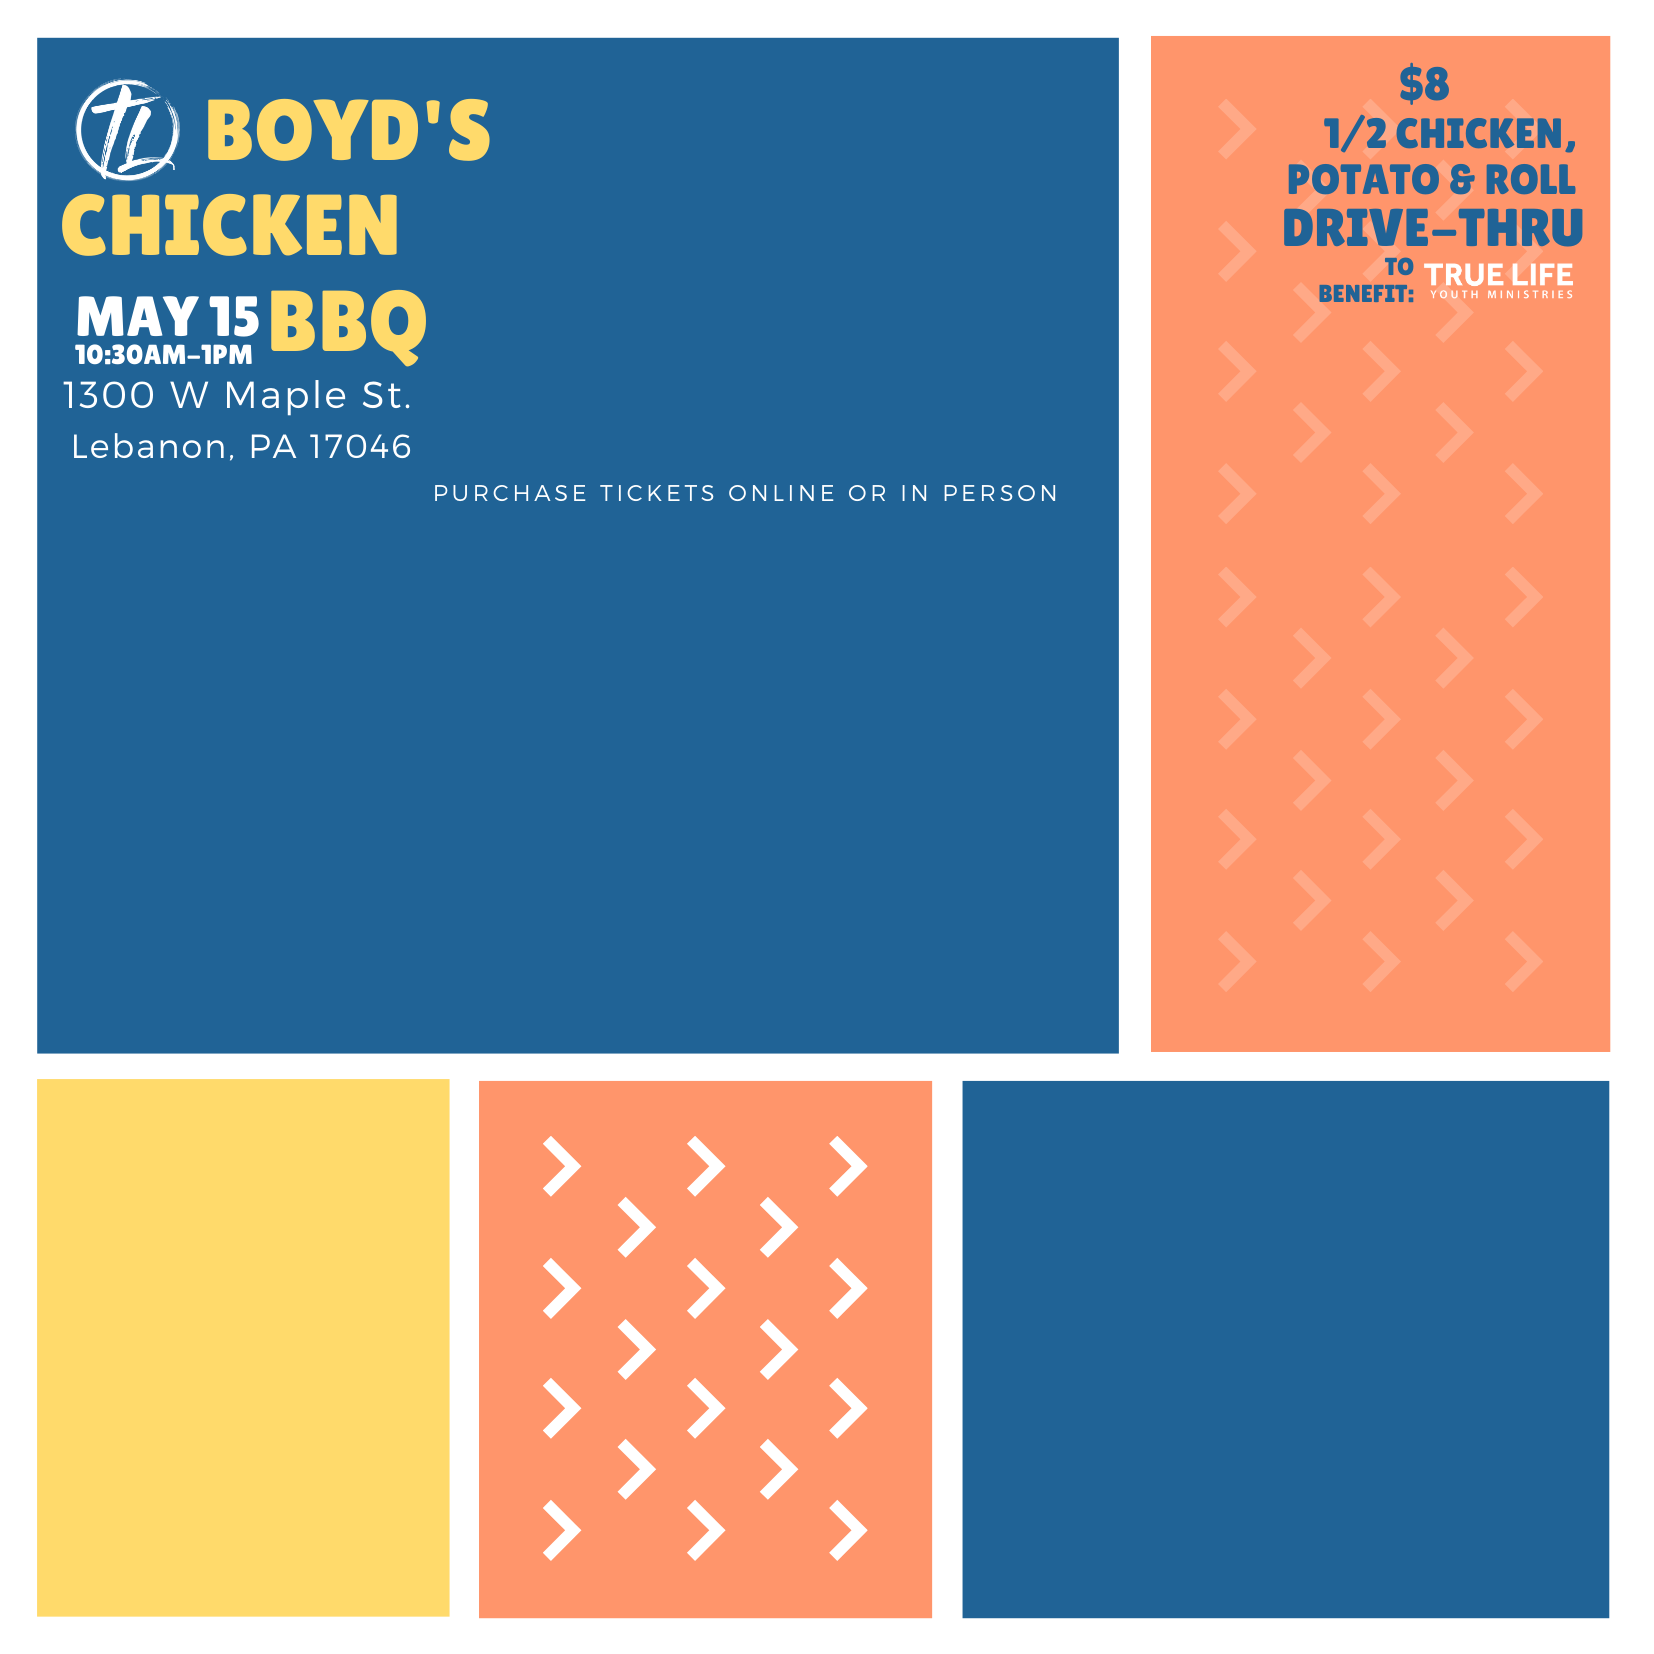 2021 Boyd's Chicken BBQ image